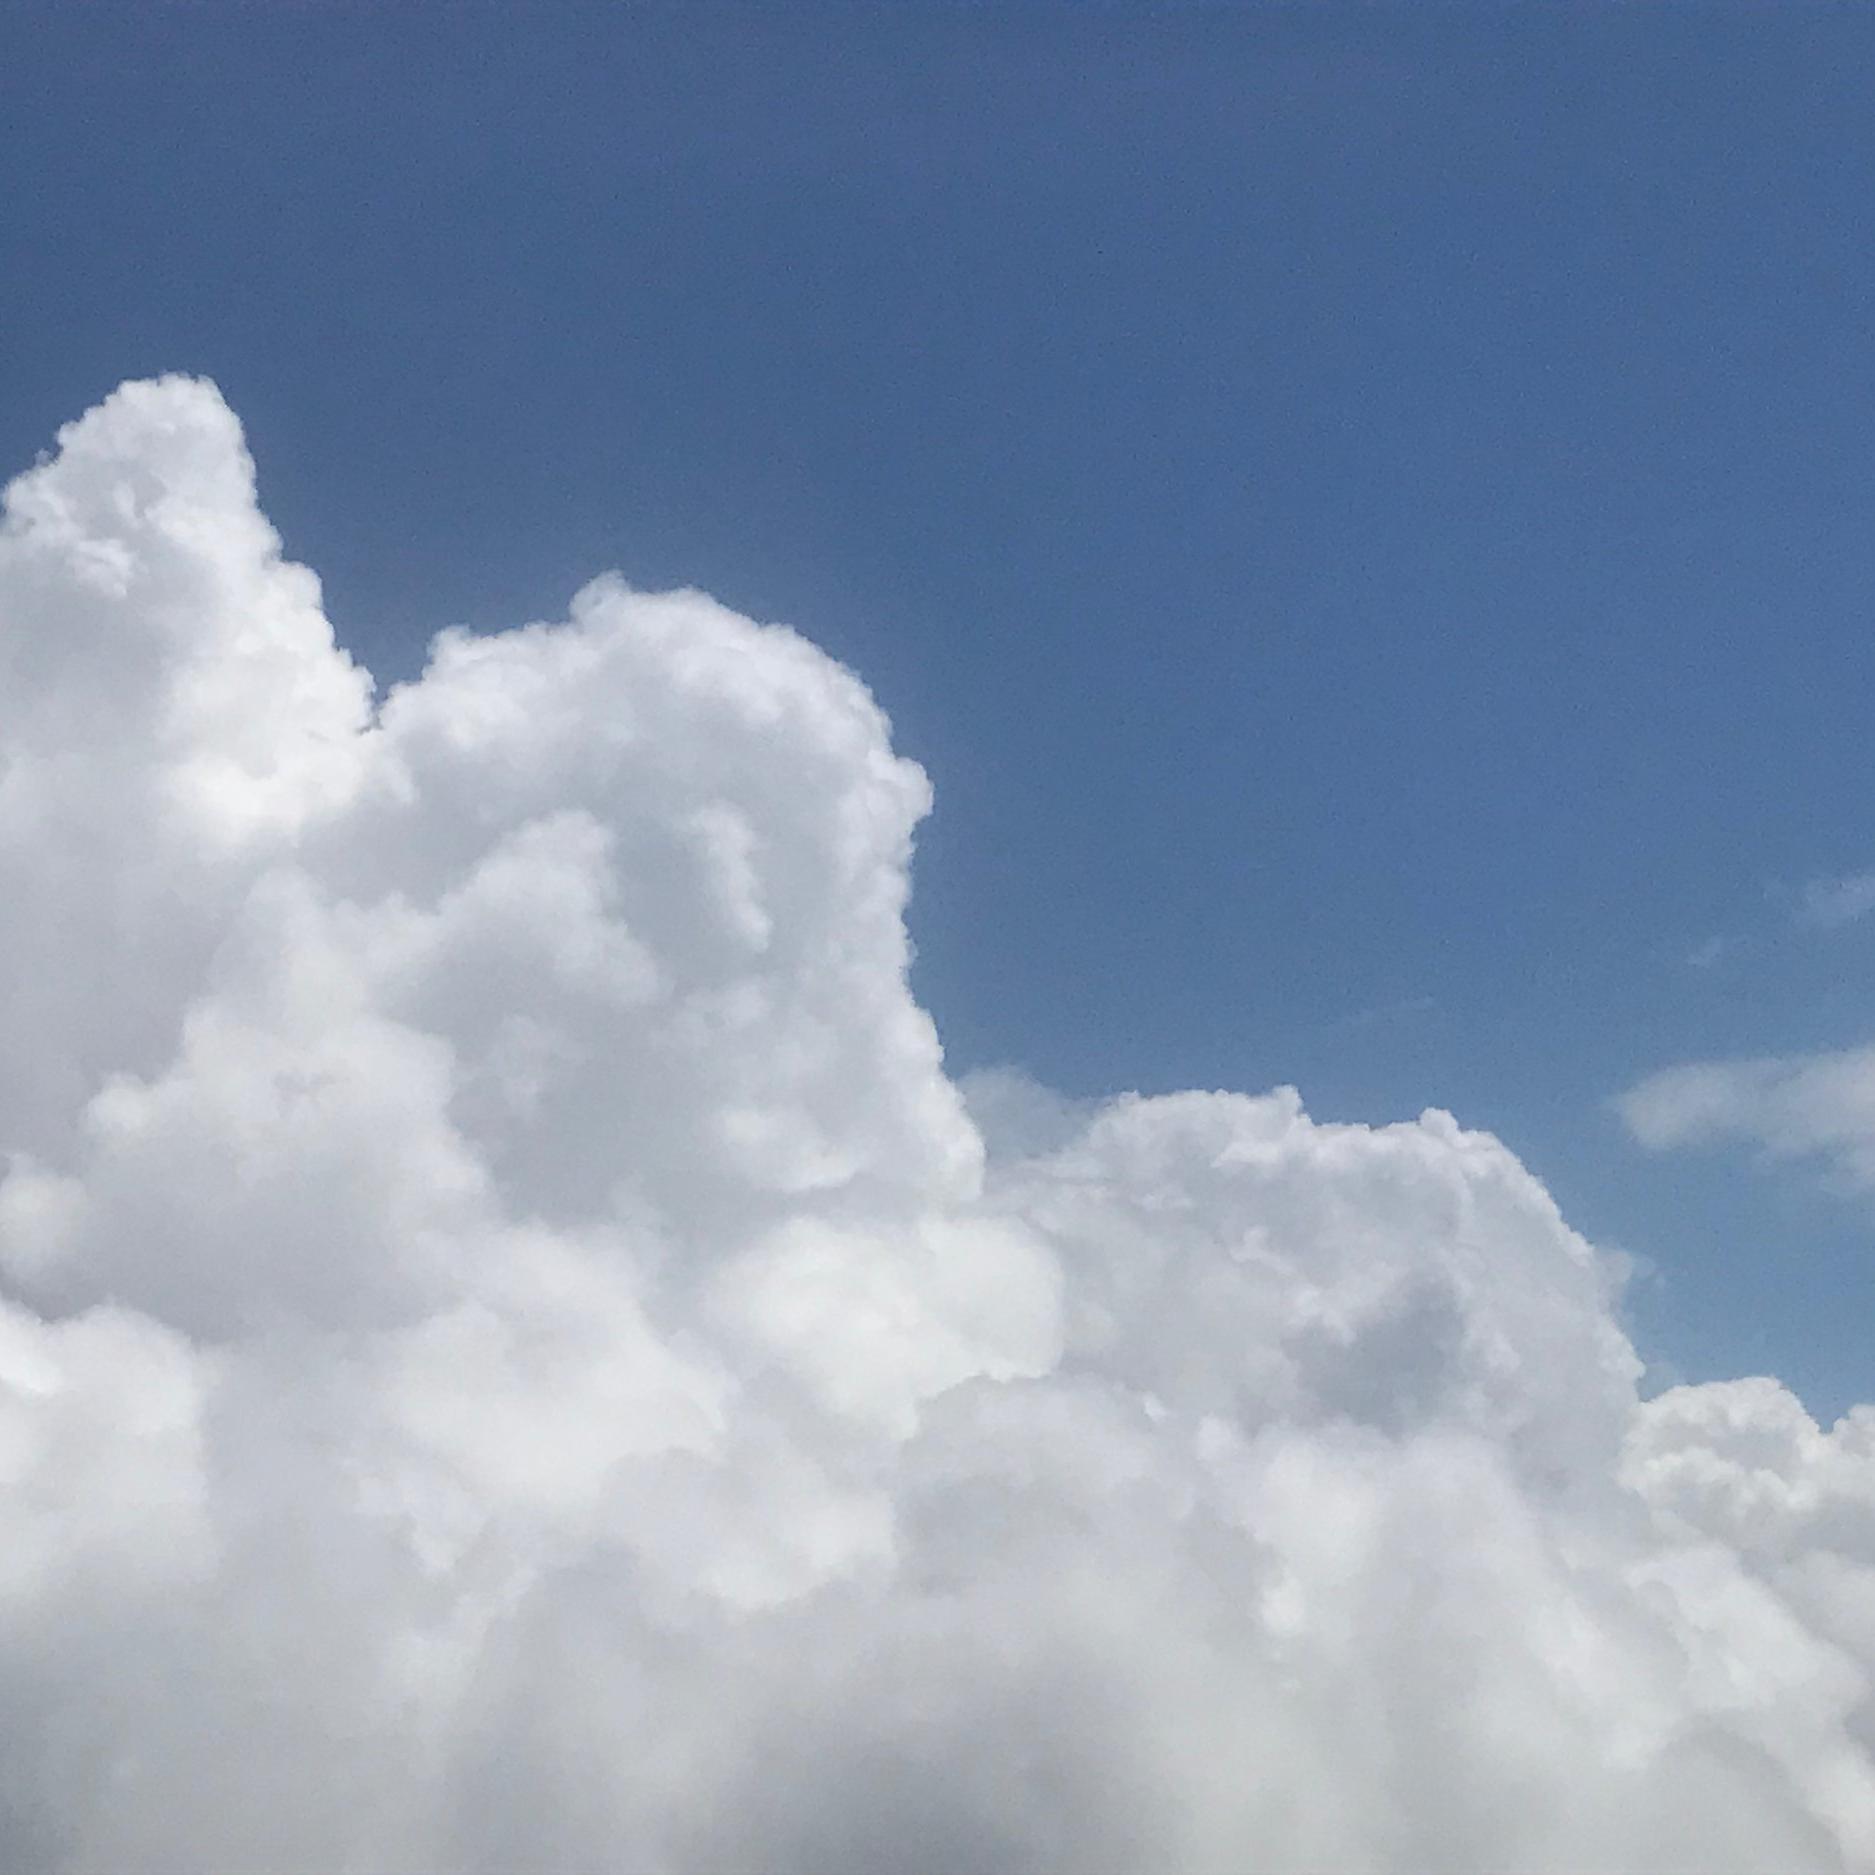 MountainRose-clouds.jpg